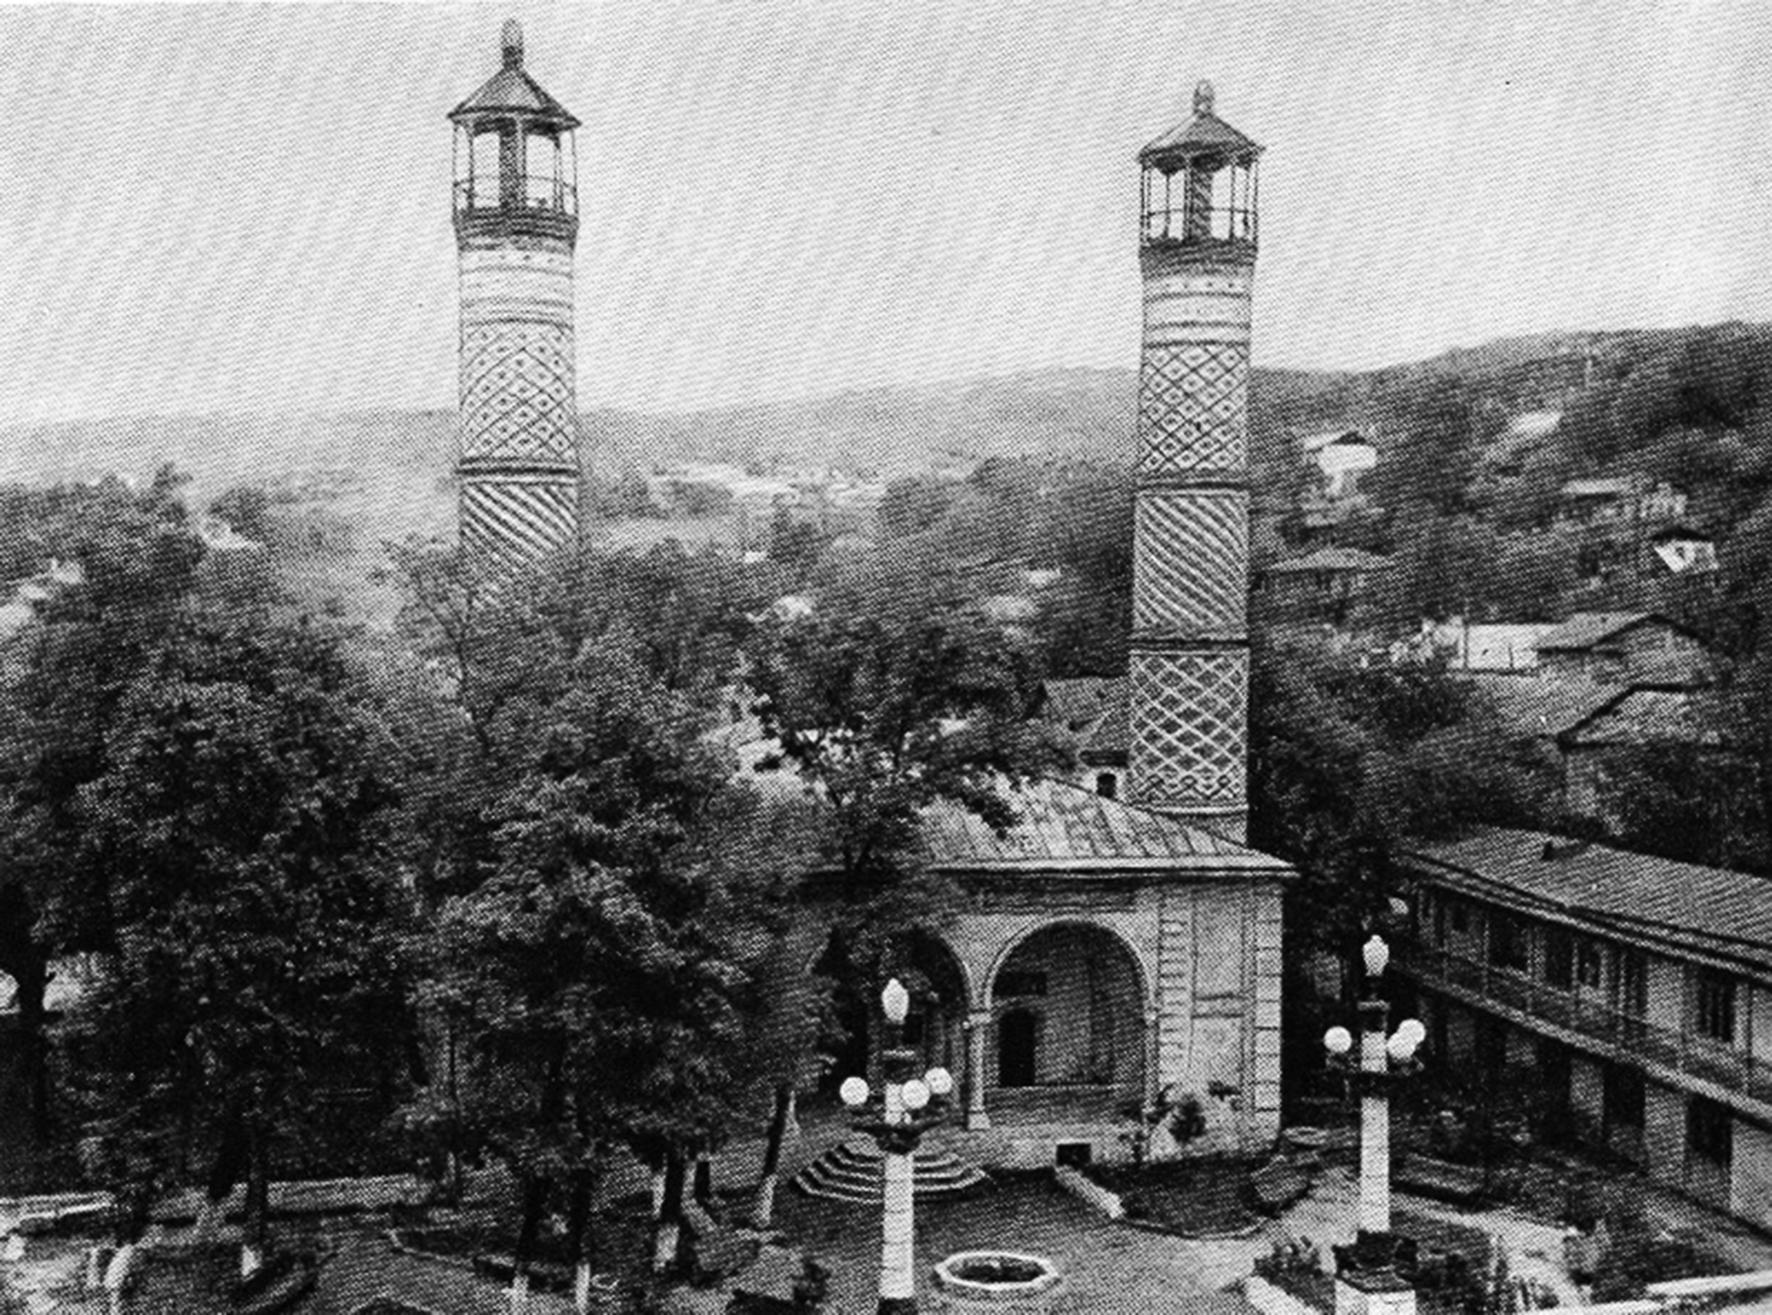 Мечеть Говхар-аги в Шуши. Фото 1980-х годов.